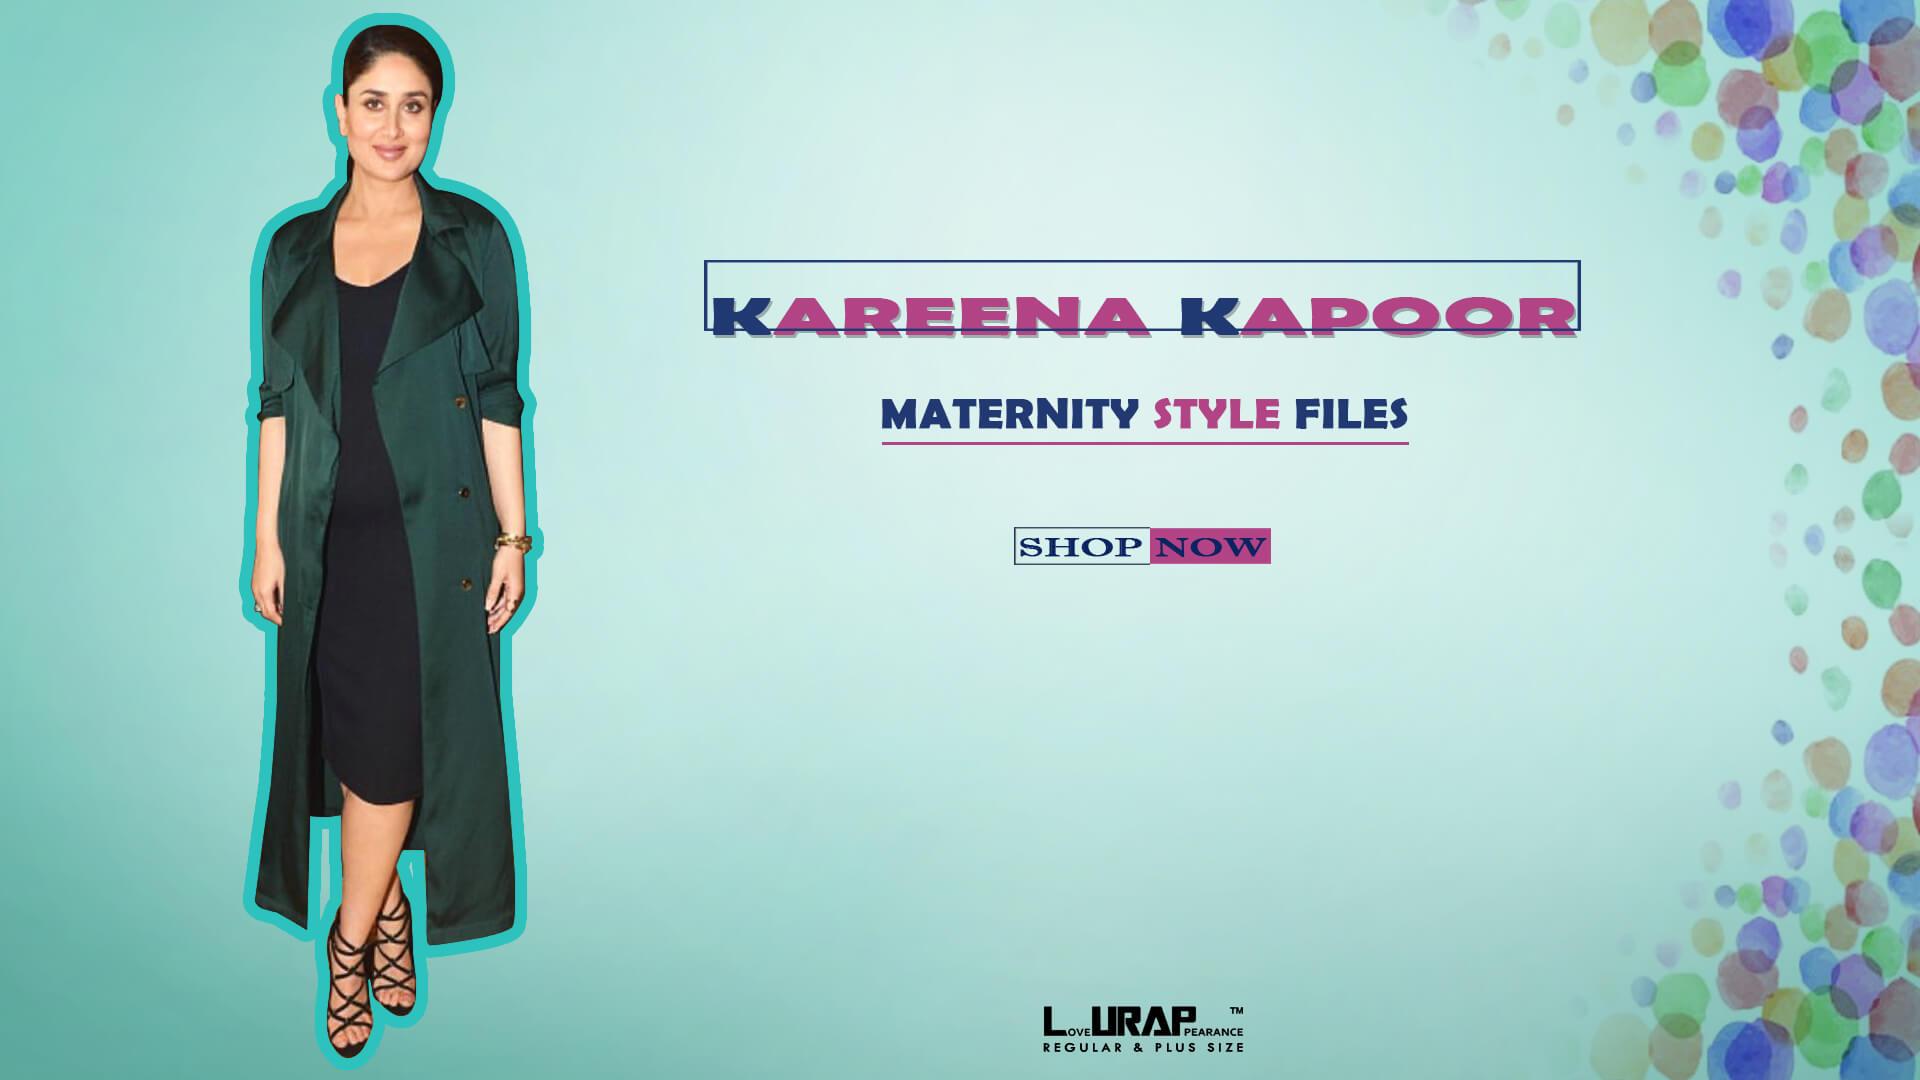 Kareena Kapoor's Maternity Style